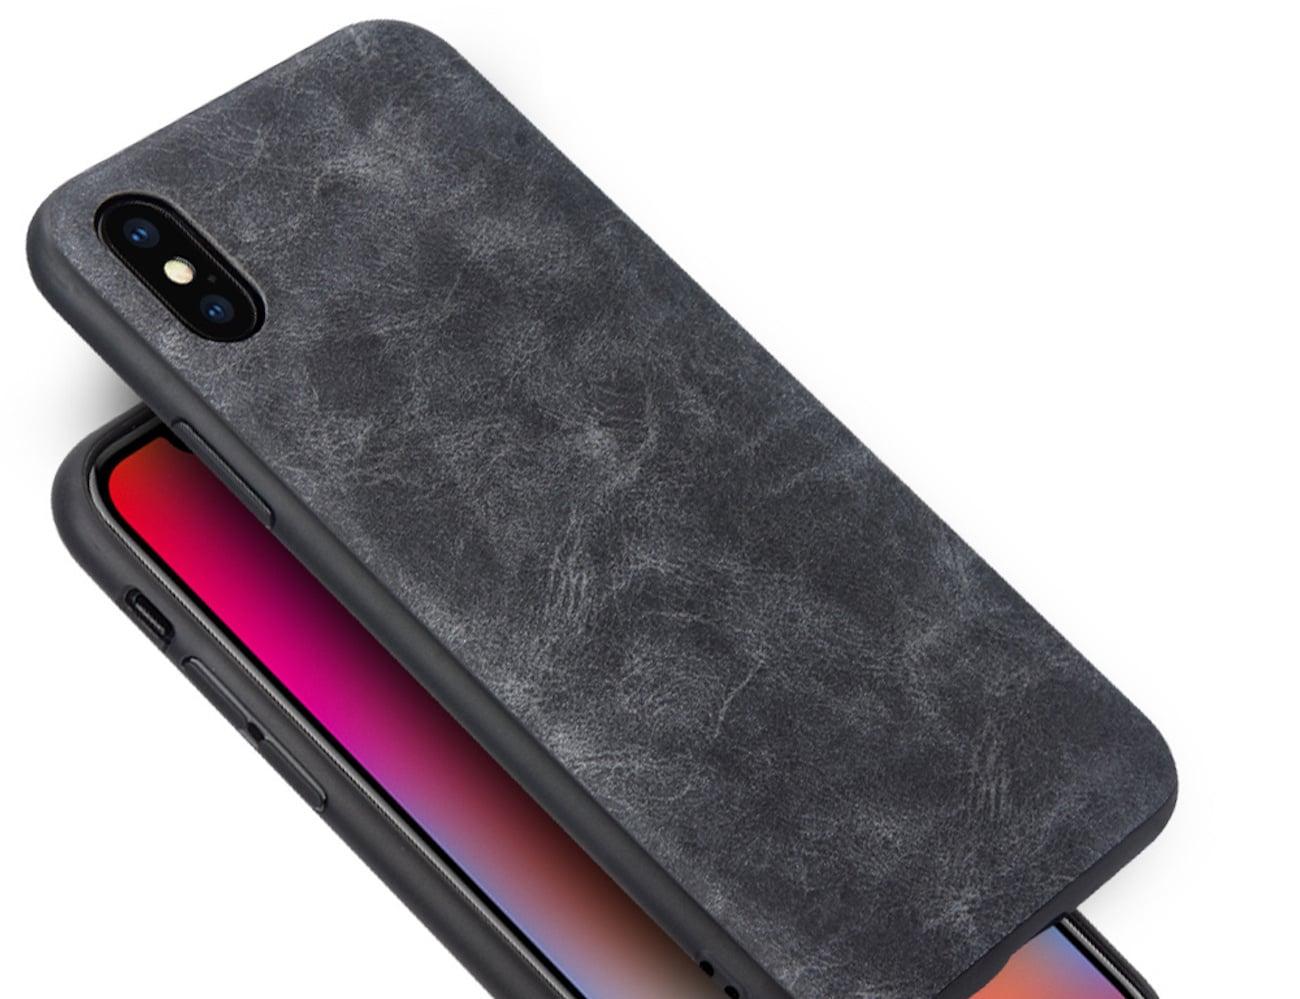 Iphonex Phone Cases: Luxury IPhone X Vintage Case » Gadget Flow